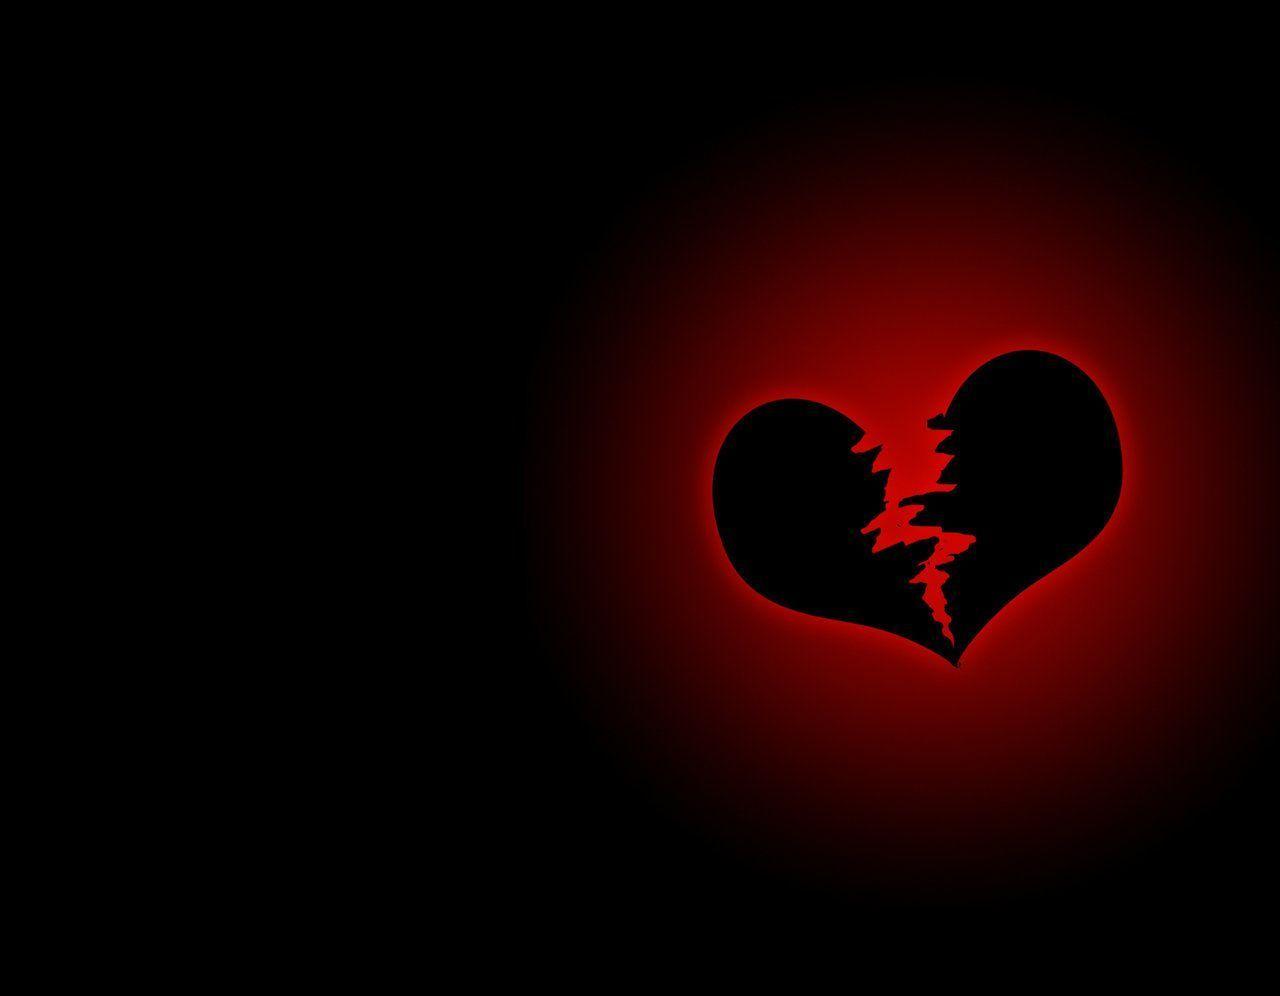 Images 2013 Breaking Heart Wallpaper